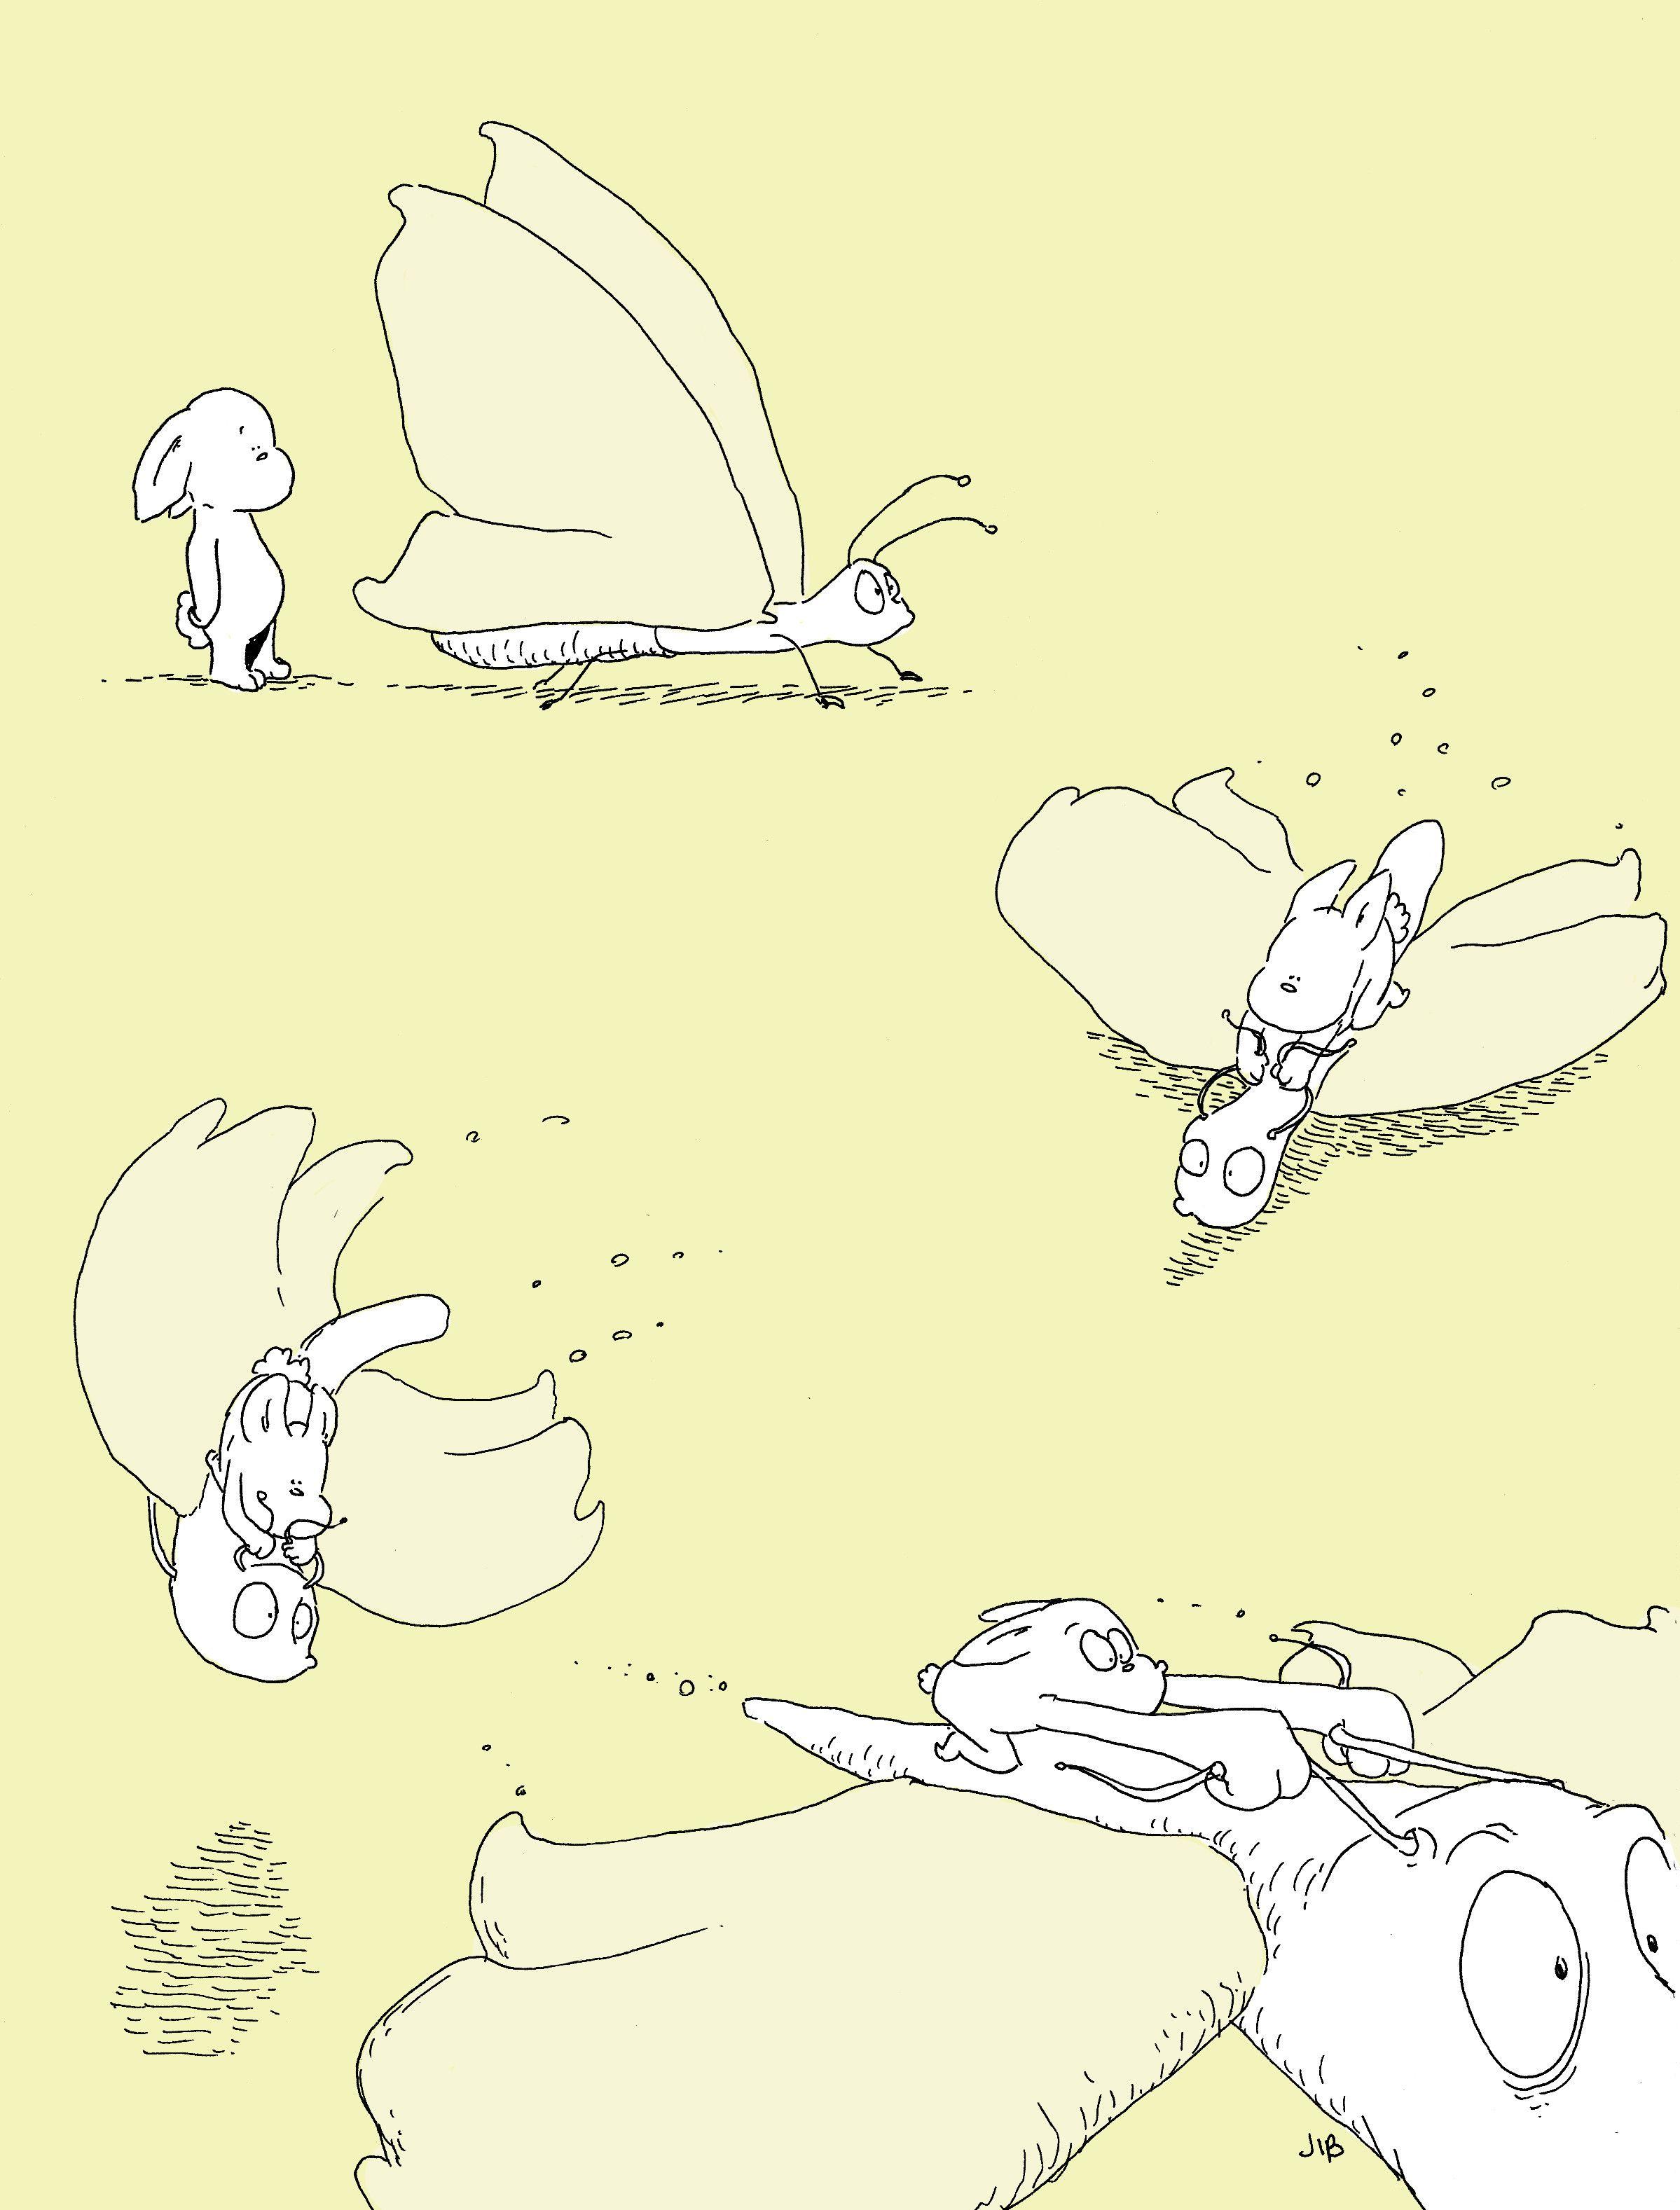 #butterfly #fly #papillon #voler